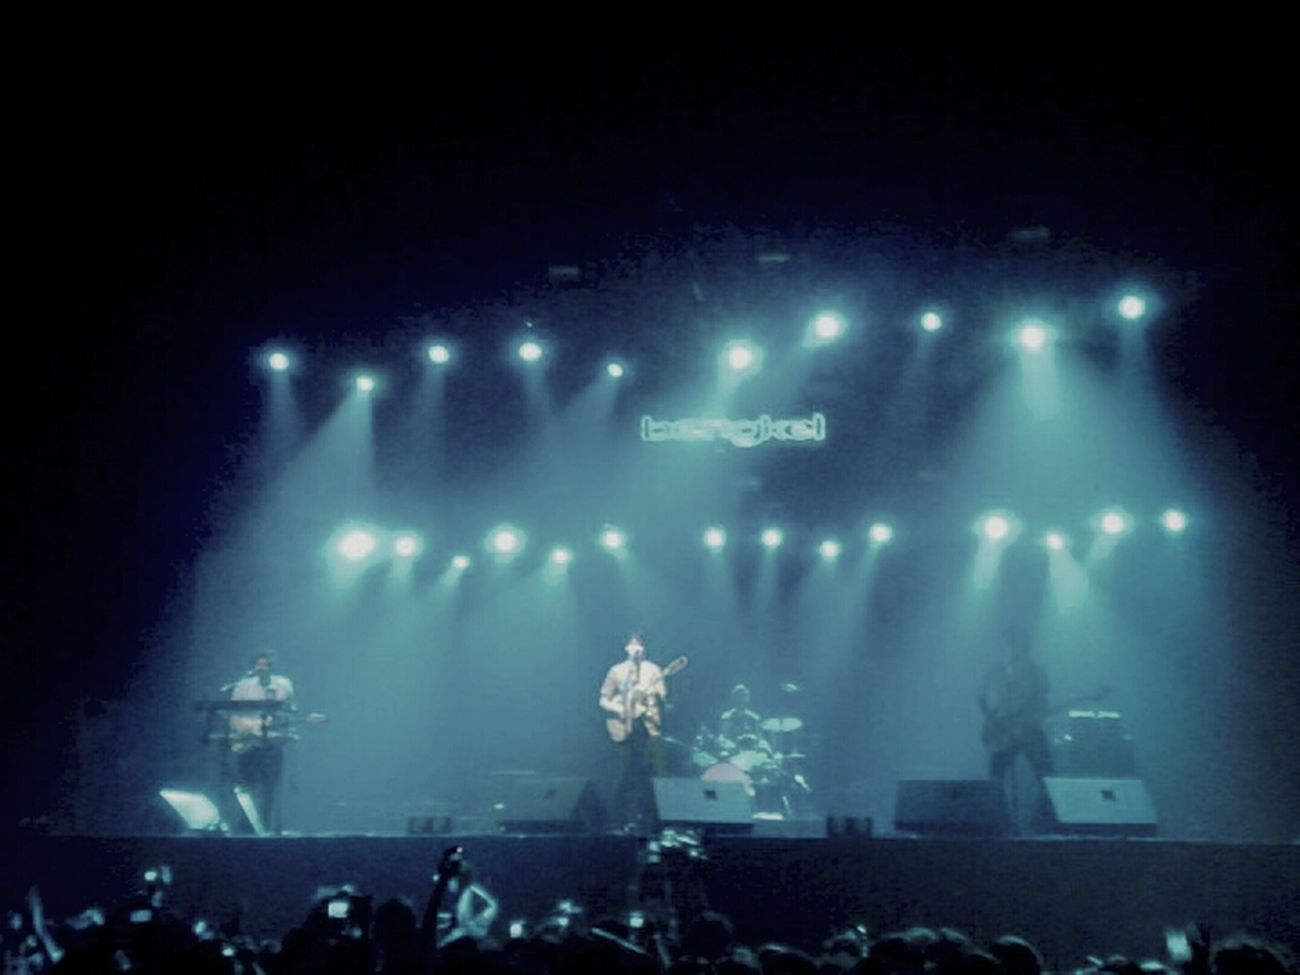 Bandswelove Vampire Weekend live in Jakarta, 2009